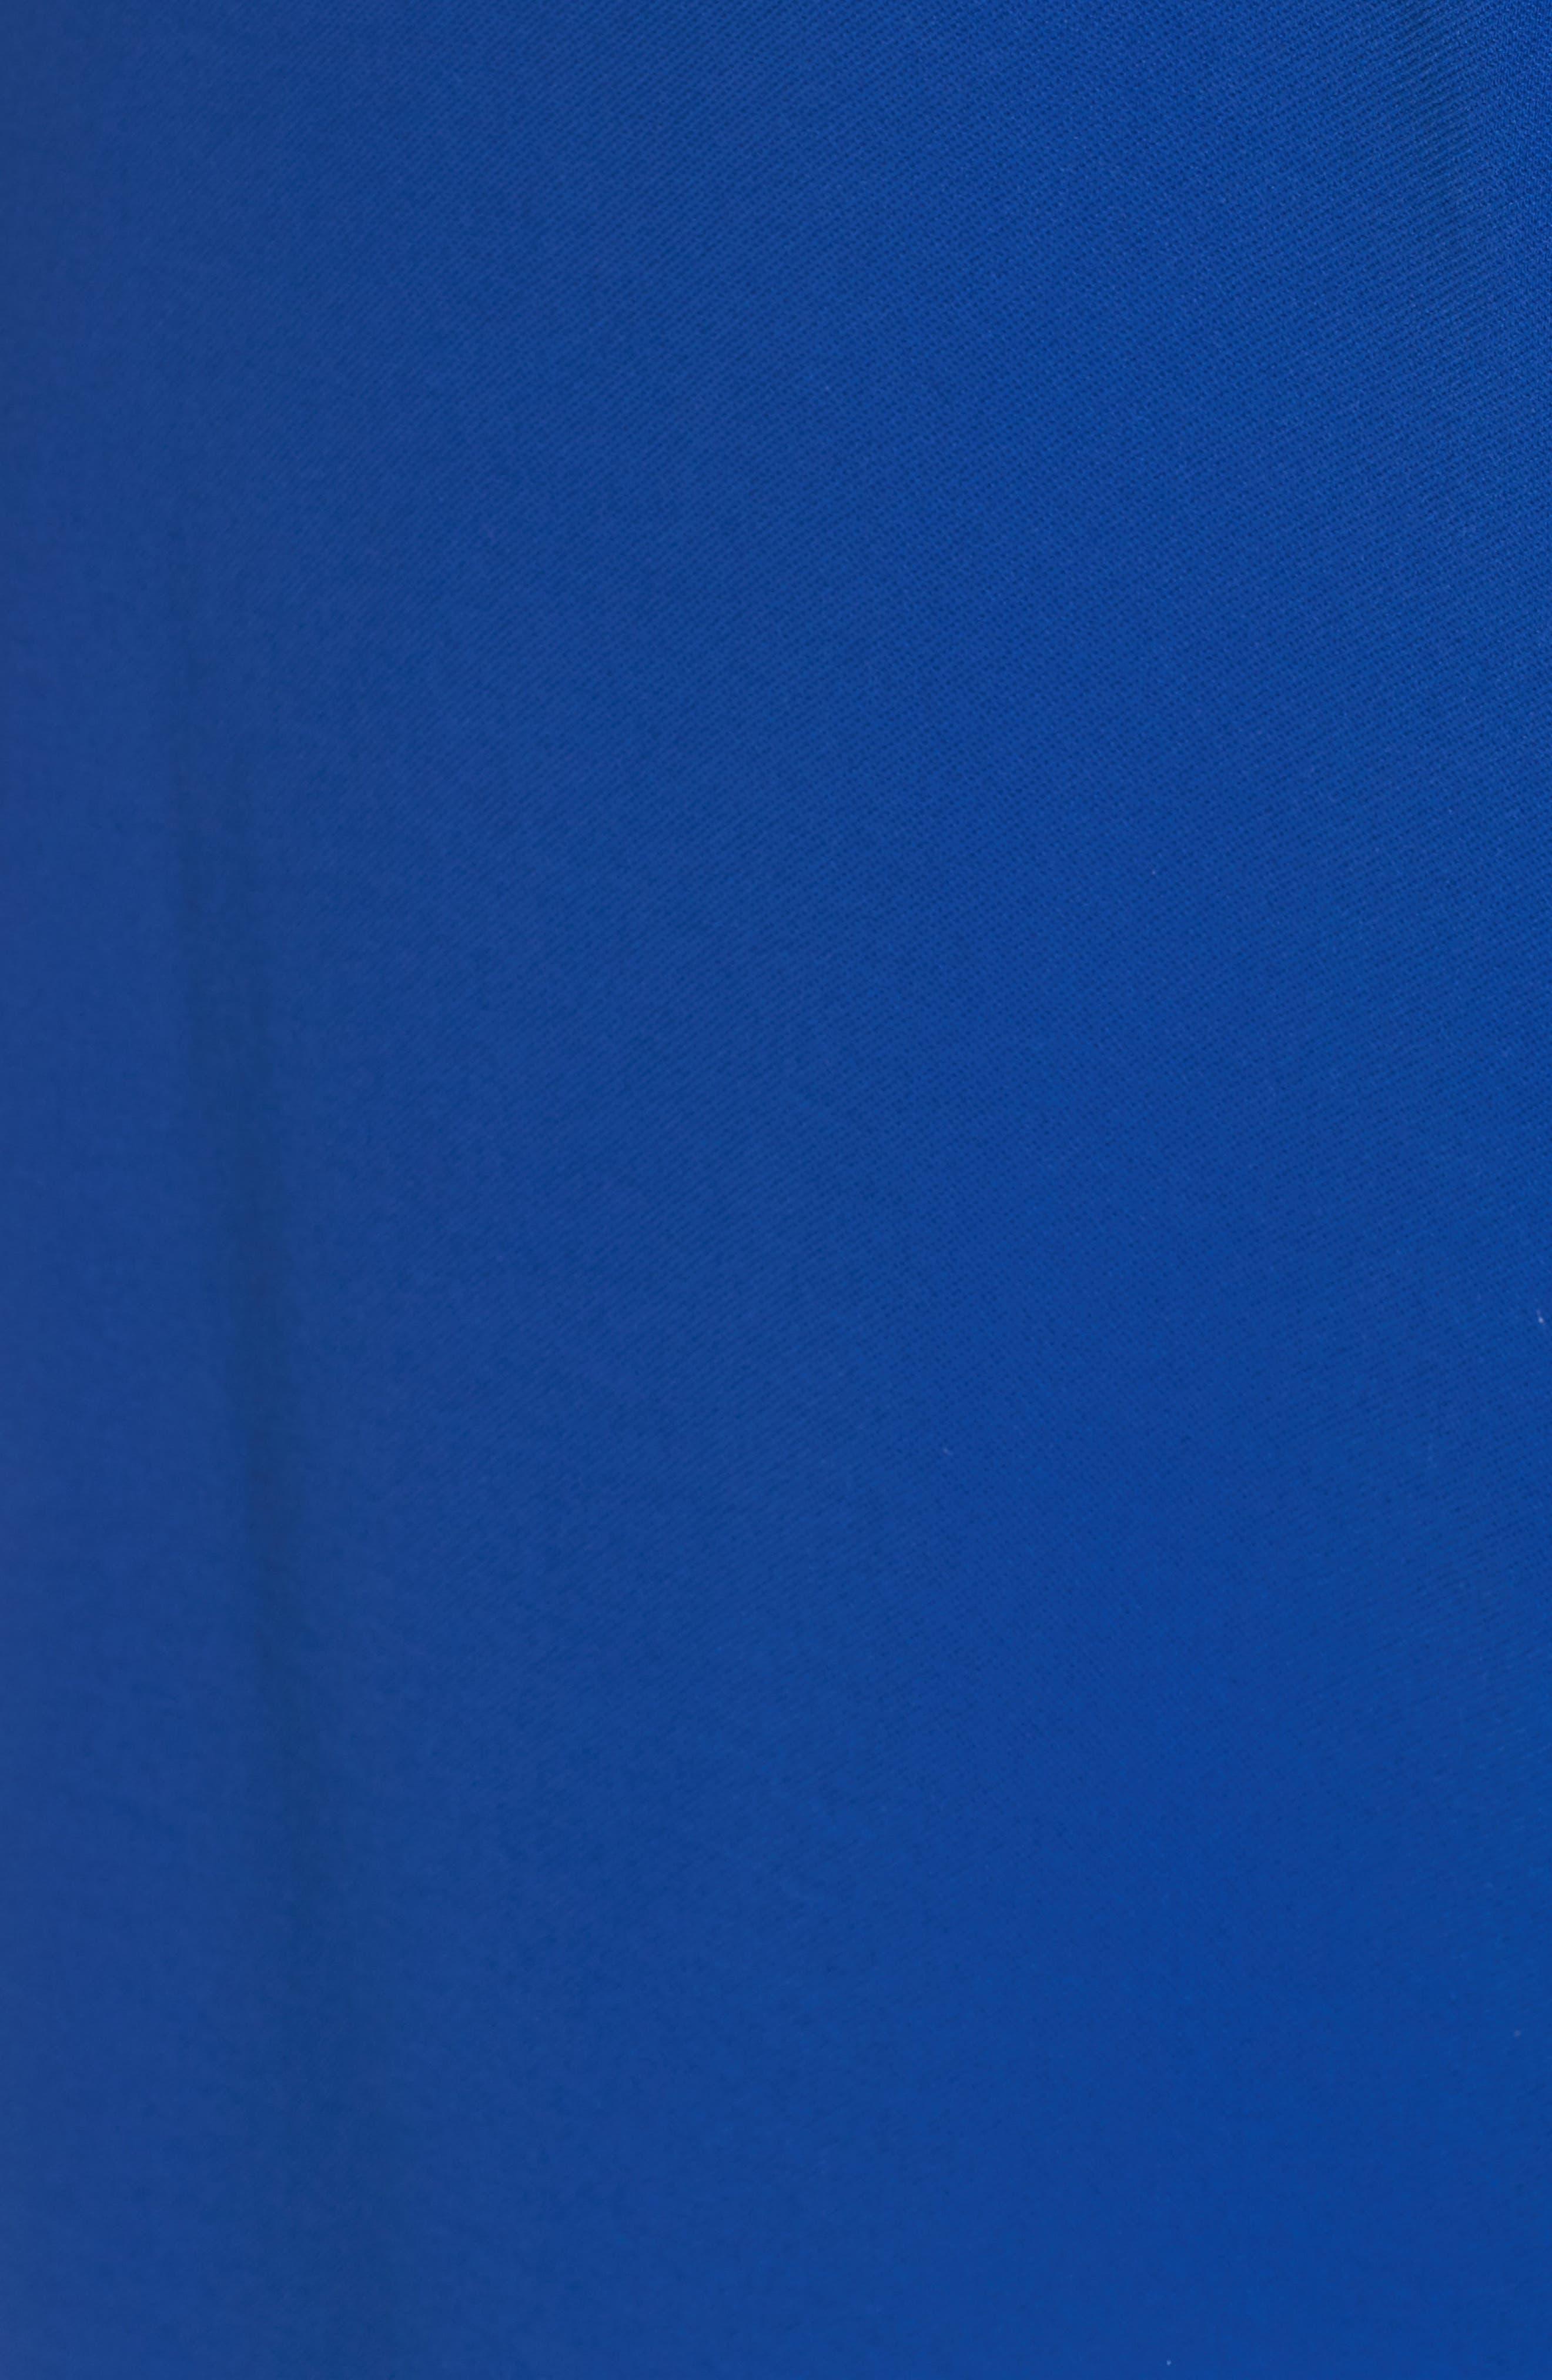 Gauzy Crepe Shirtdress,                             Alternate thumbnail 6, color,                             Cobalt